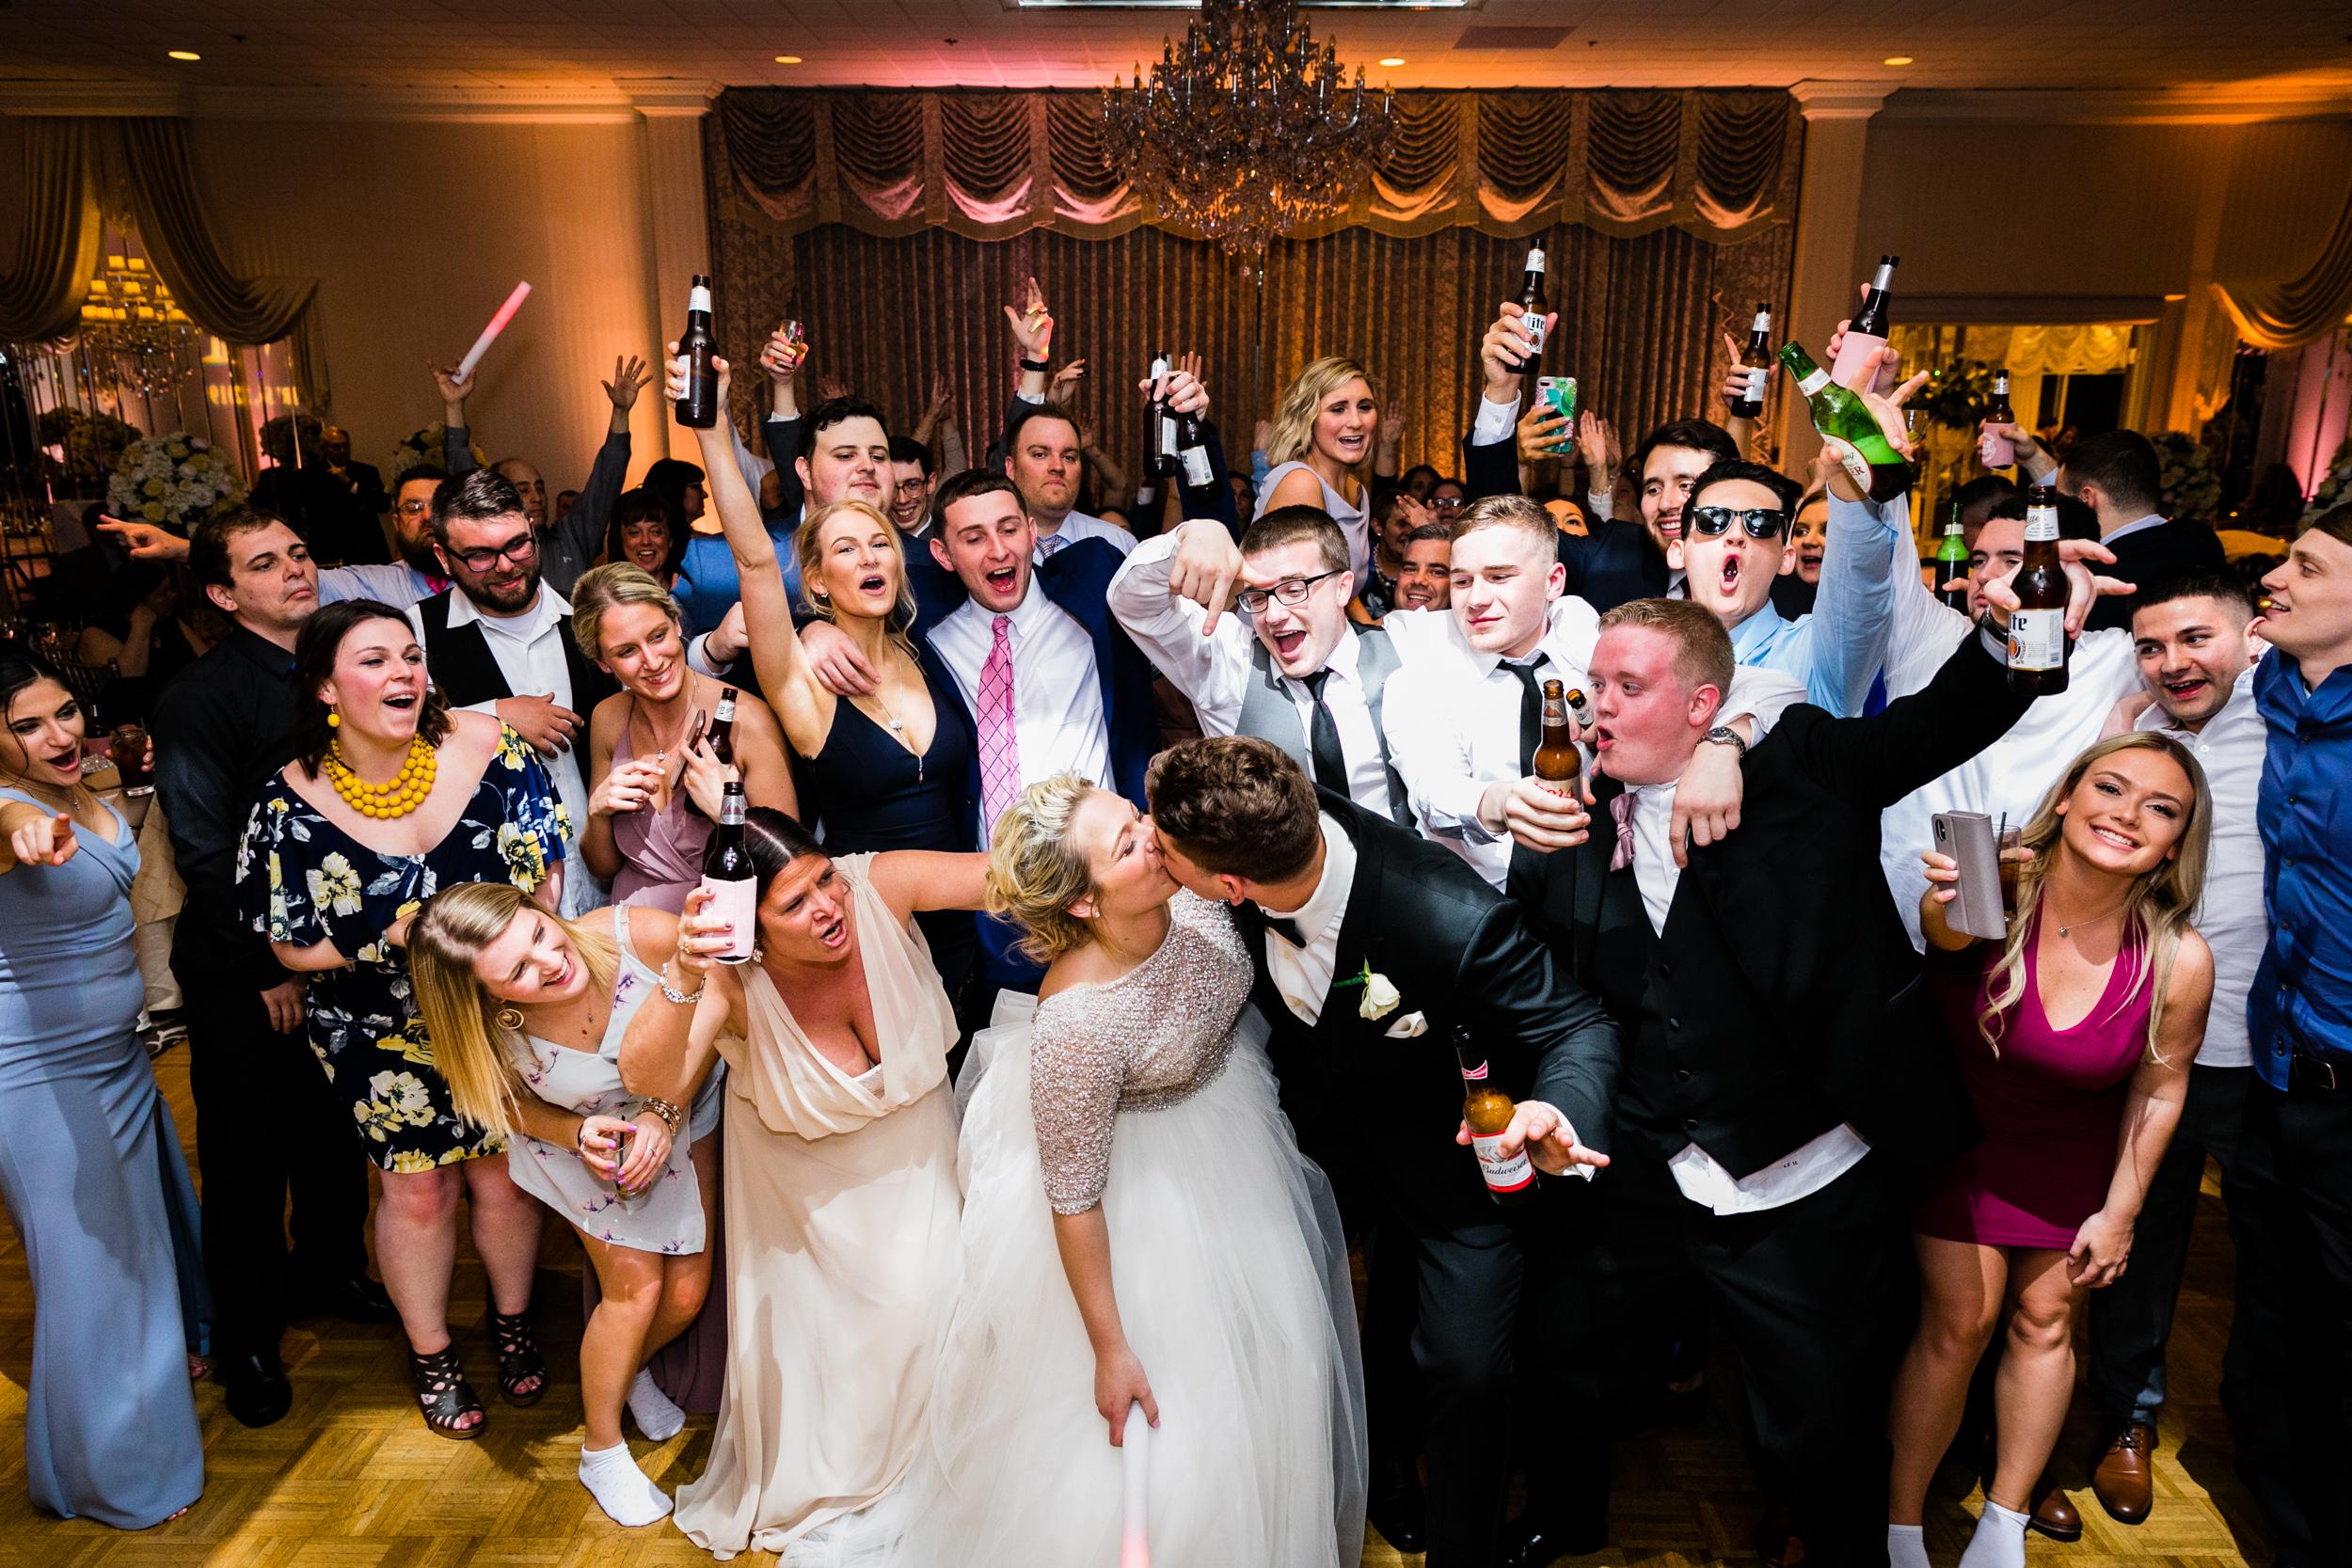 CELEBRATIONS BENSALEM WEDDING PHOTOGRAPHY-124.jpg